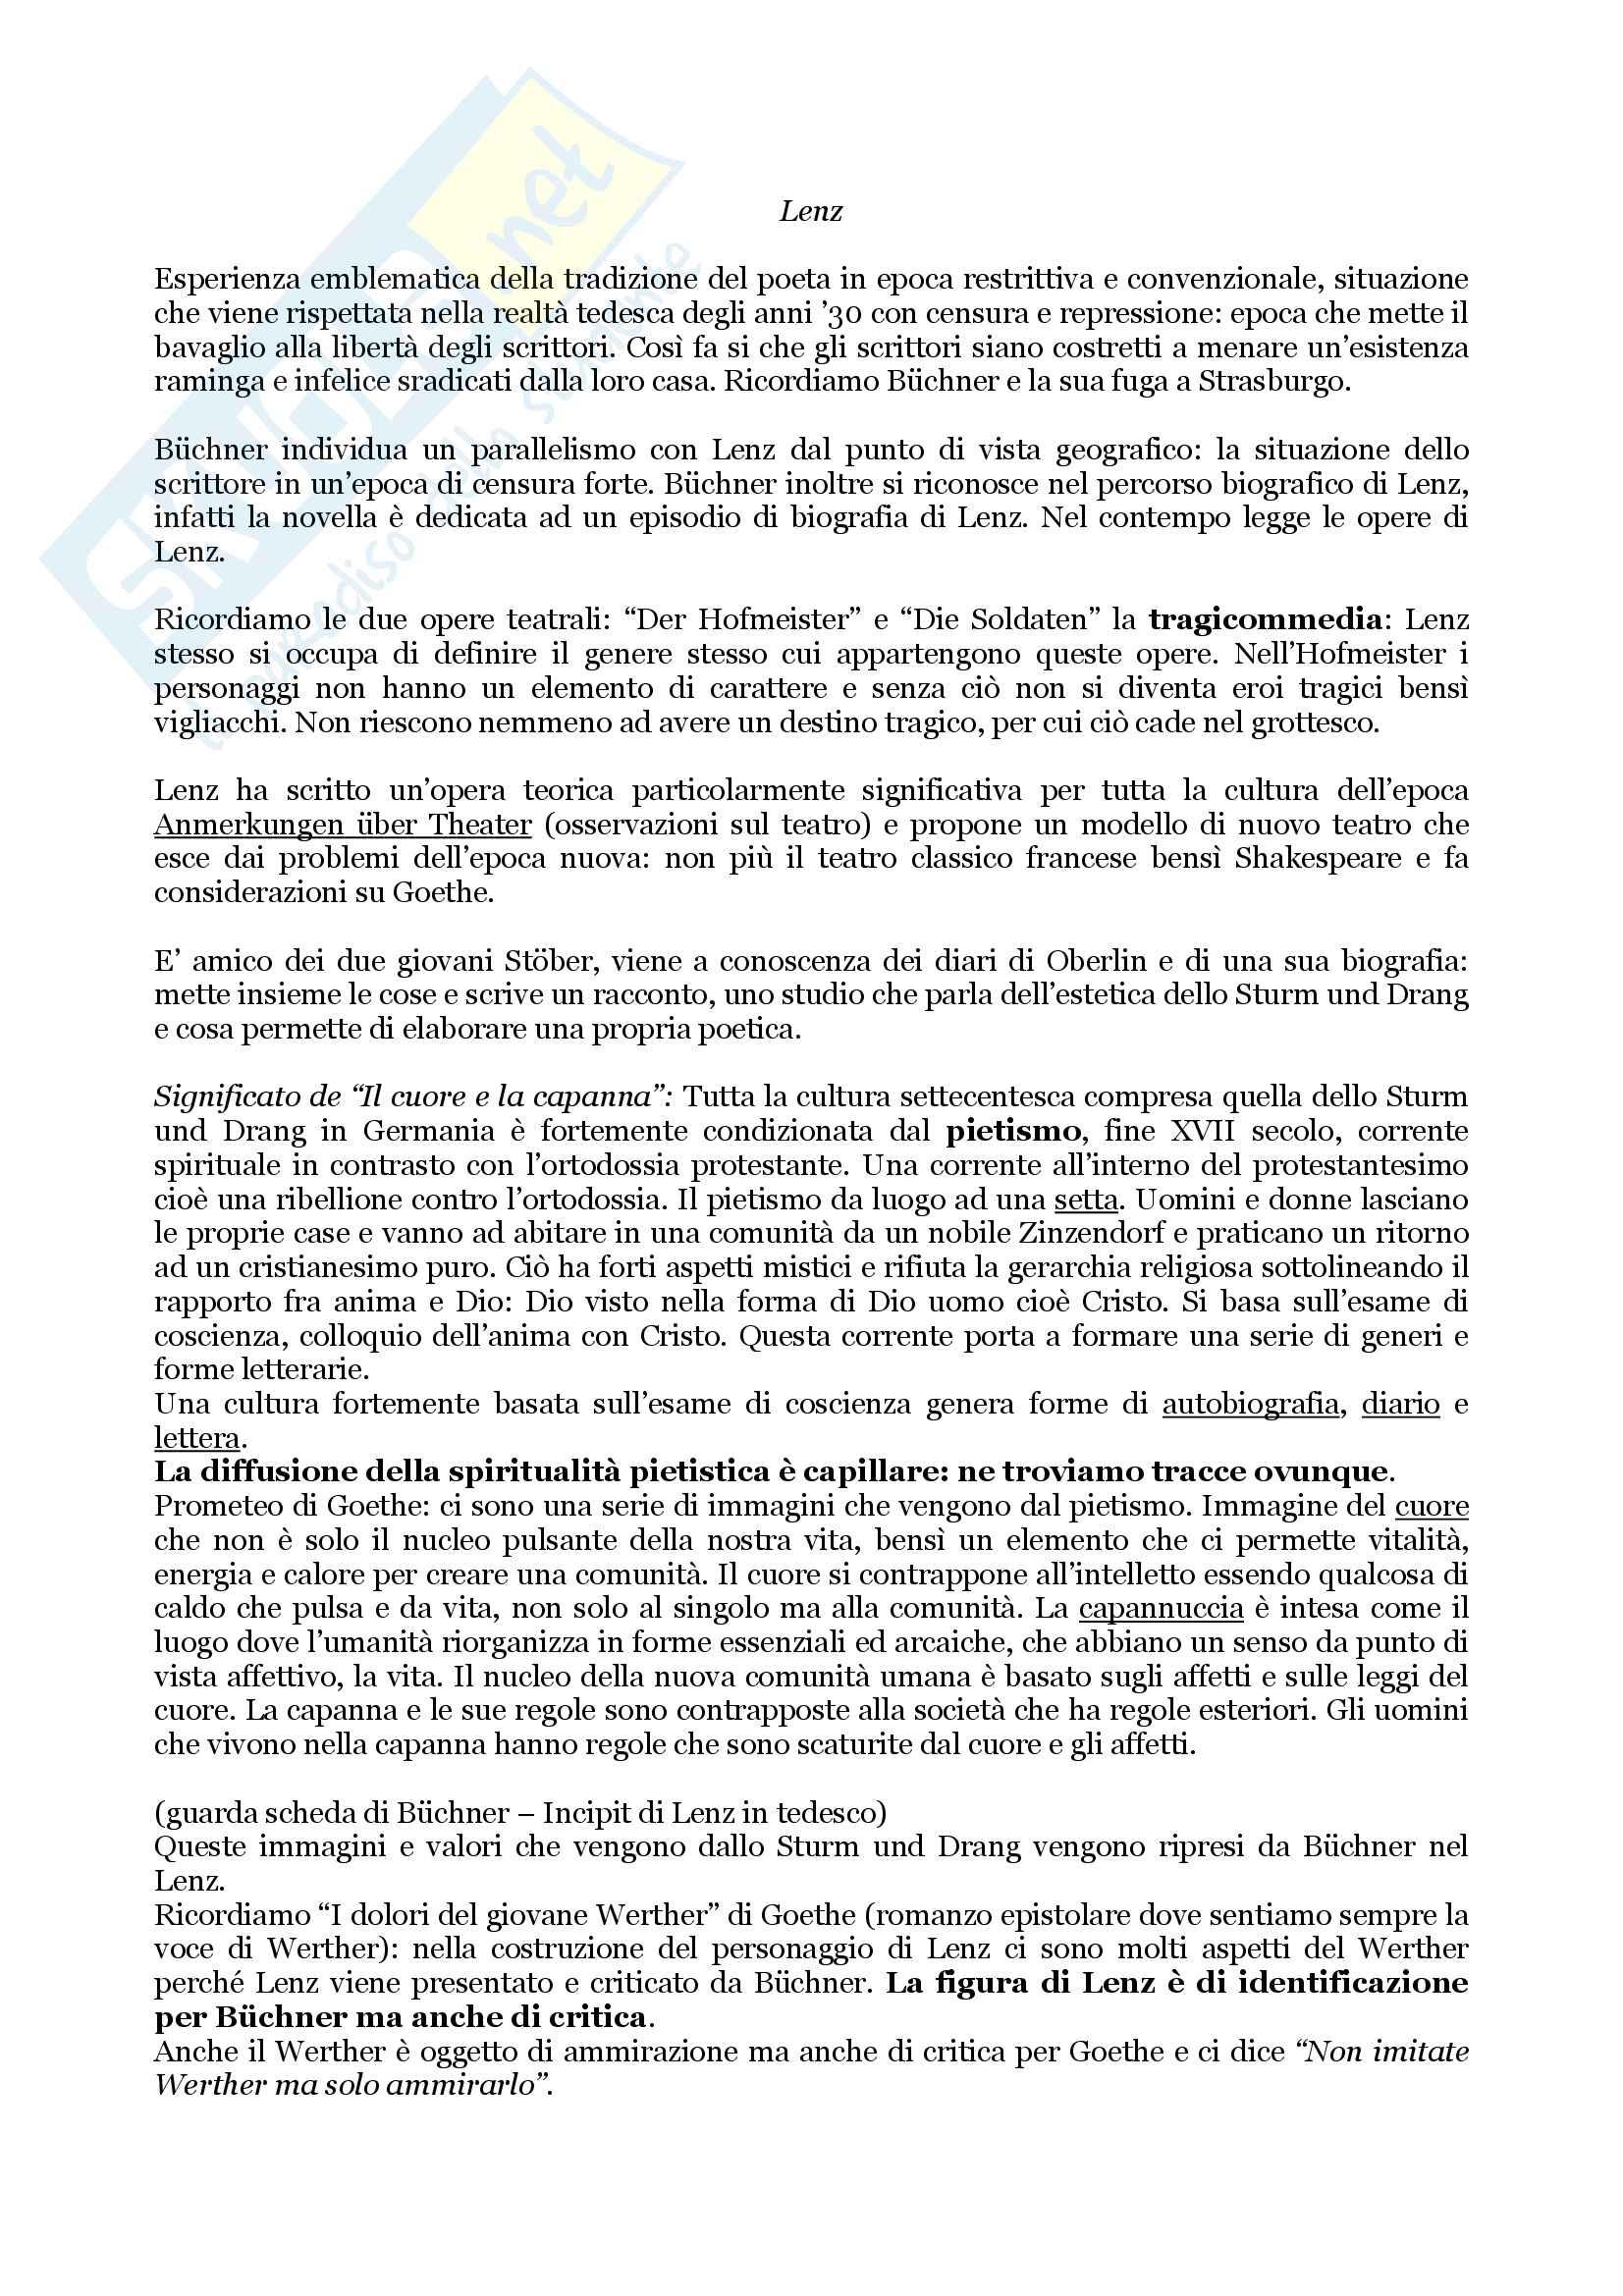 Riassunto esame Letteratura Tedesca, docente Giovanna Cermelli, libro Lenz di Georg Büchner